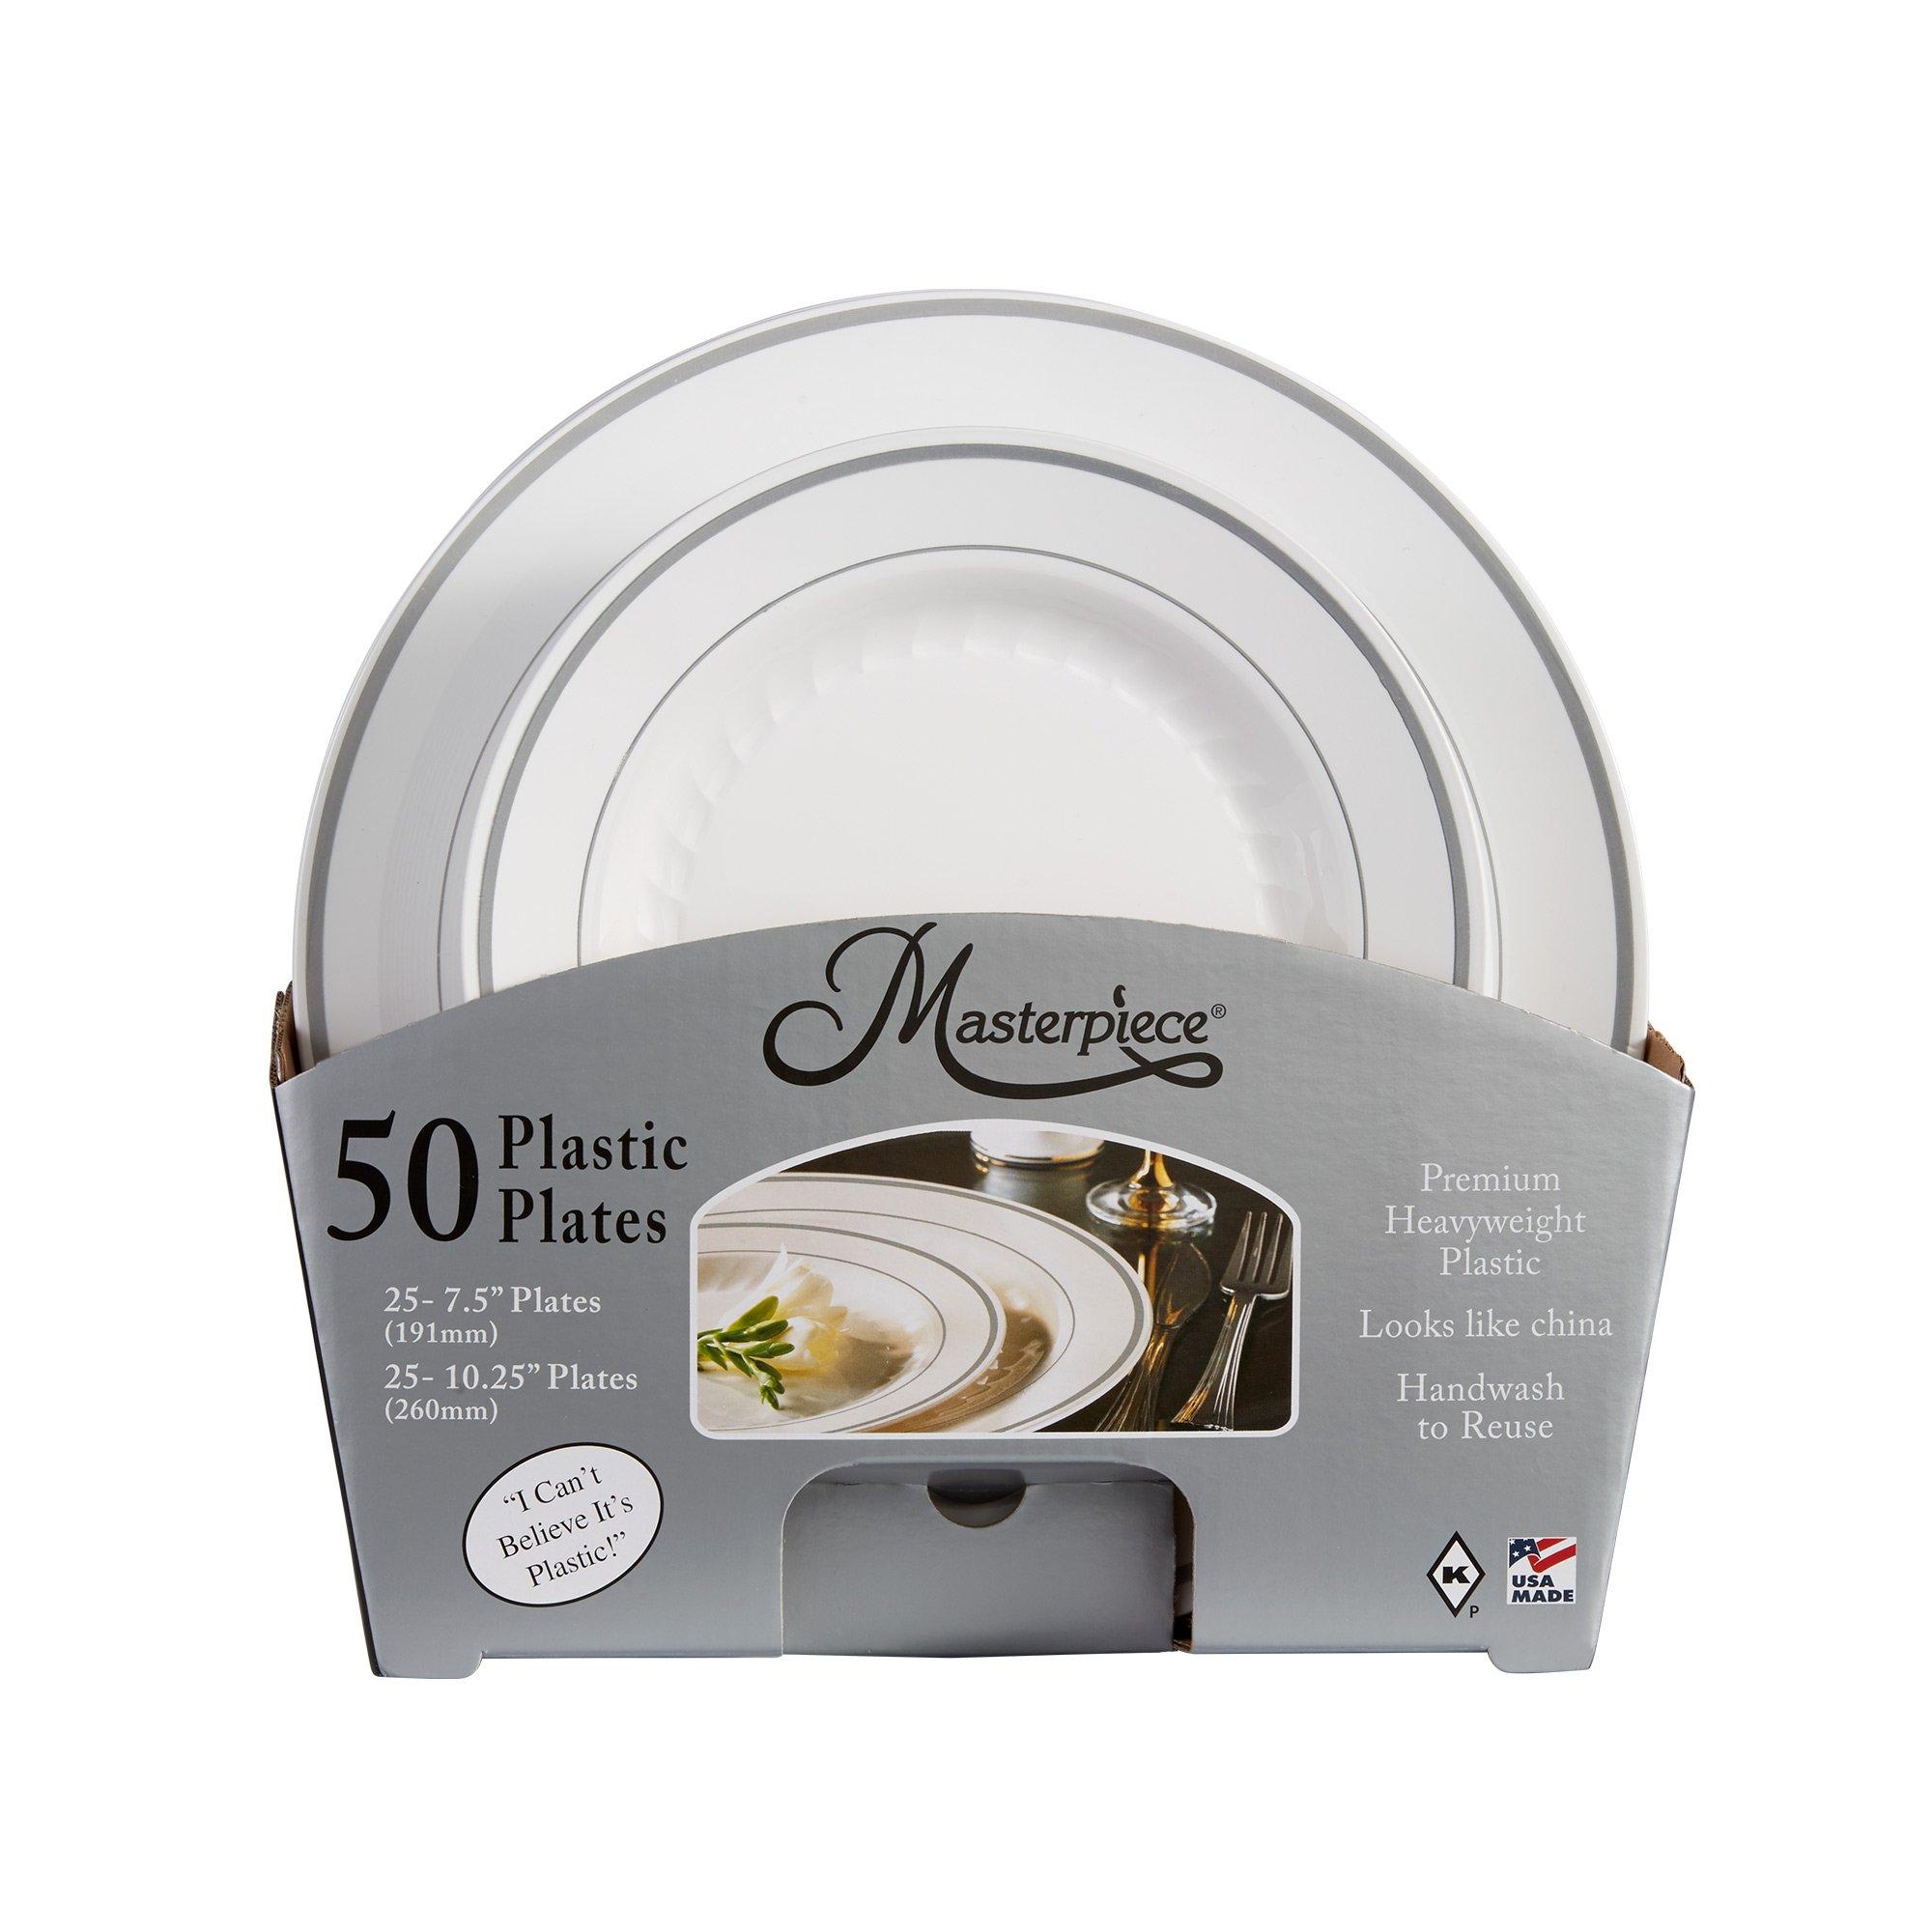 Masterpiece Premium Quality Heavyweight Plastic Plates 25 Dinner Plates and 25 Salad Plates - 2604 \u003c Plates \u003c Health \u0026 Household - TIBS  sc 1 st  TIBS & Masterpiece Premium Quality Heavyweight Plastic Plates: 25 Dinner ...